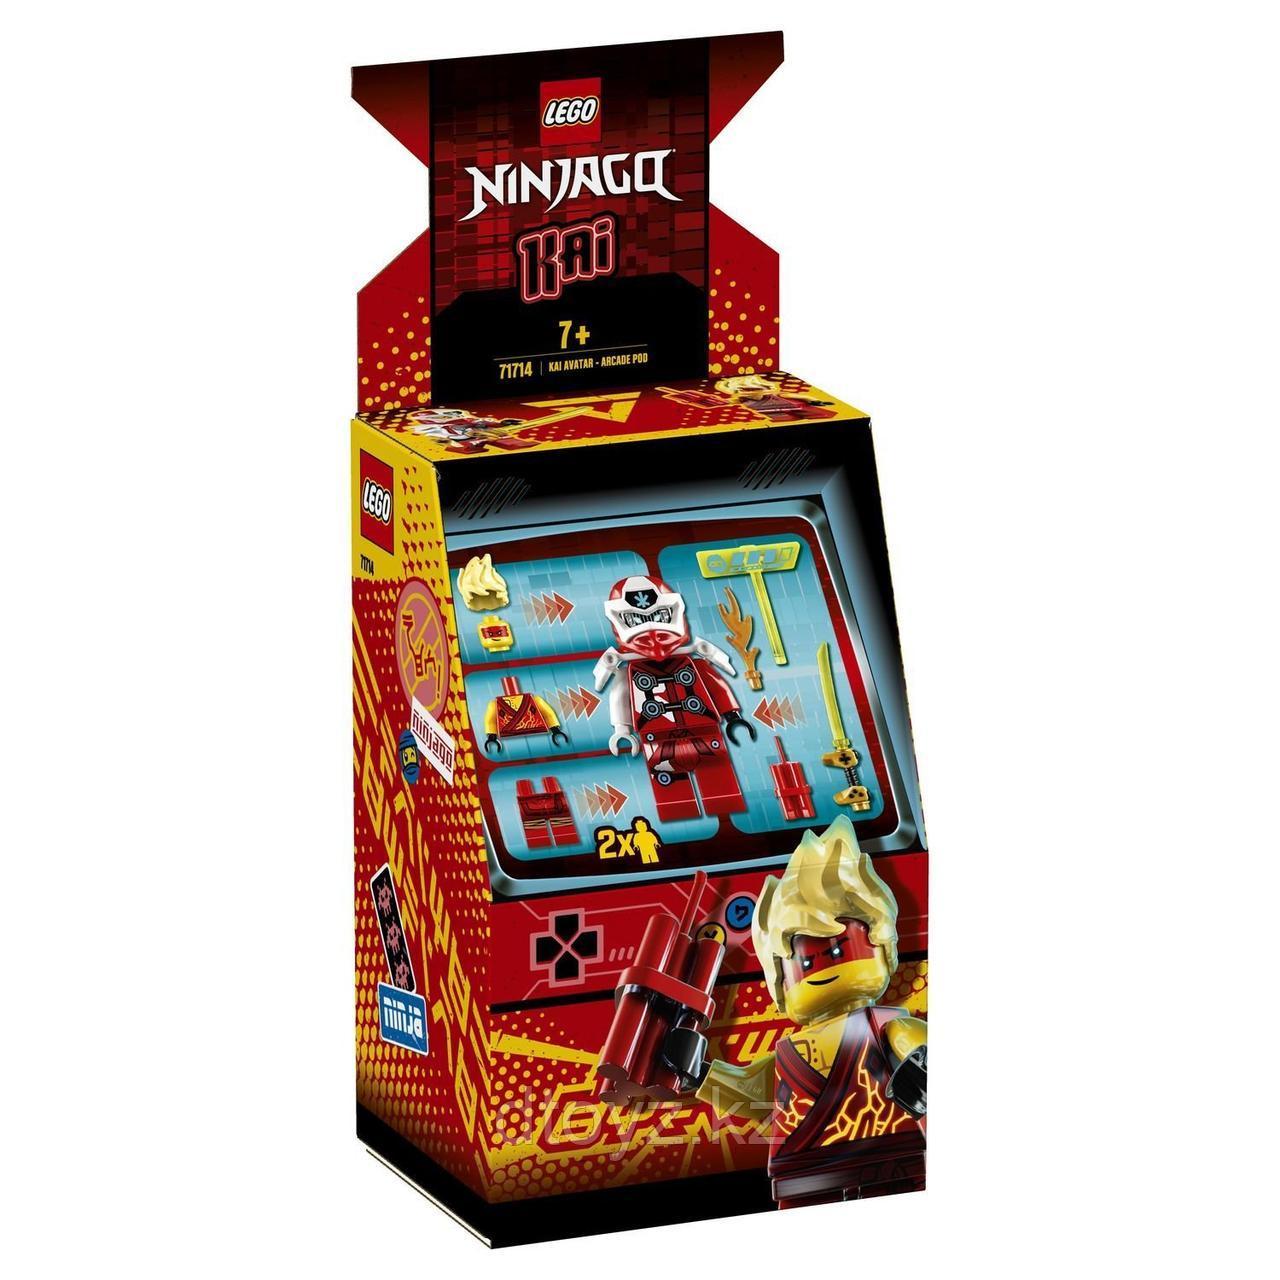 Lego Ninjago 71714 Автомат Кая